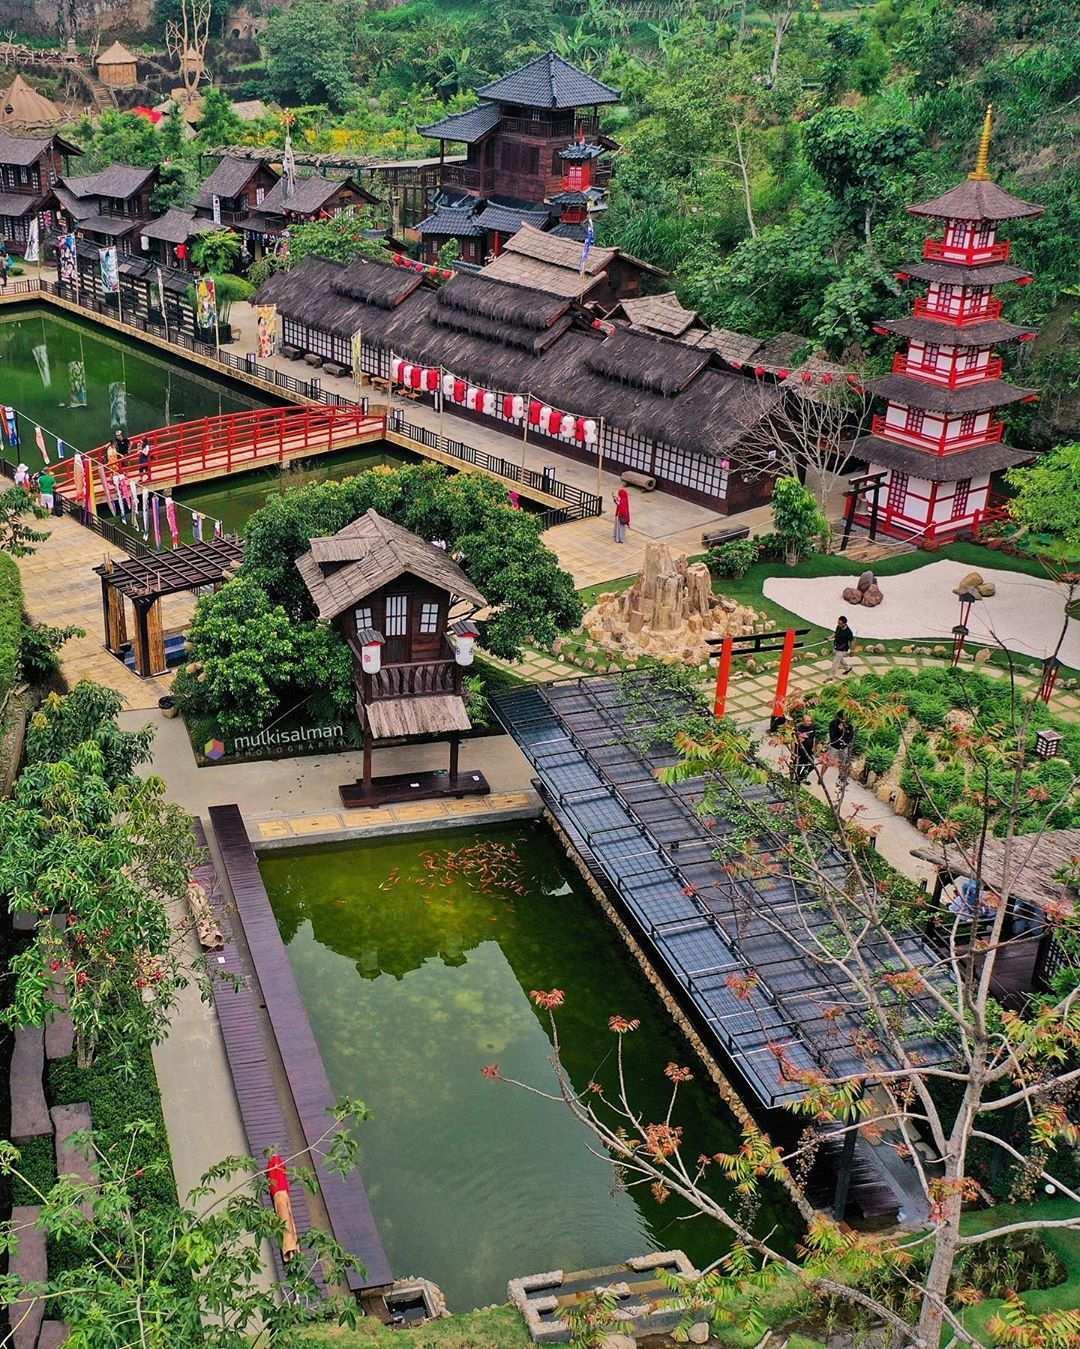 Arsitekture Pemukiman Jepang di The Great Asia Afrika, Image From @mulkisalman